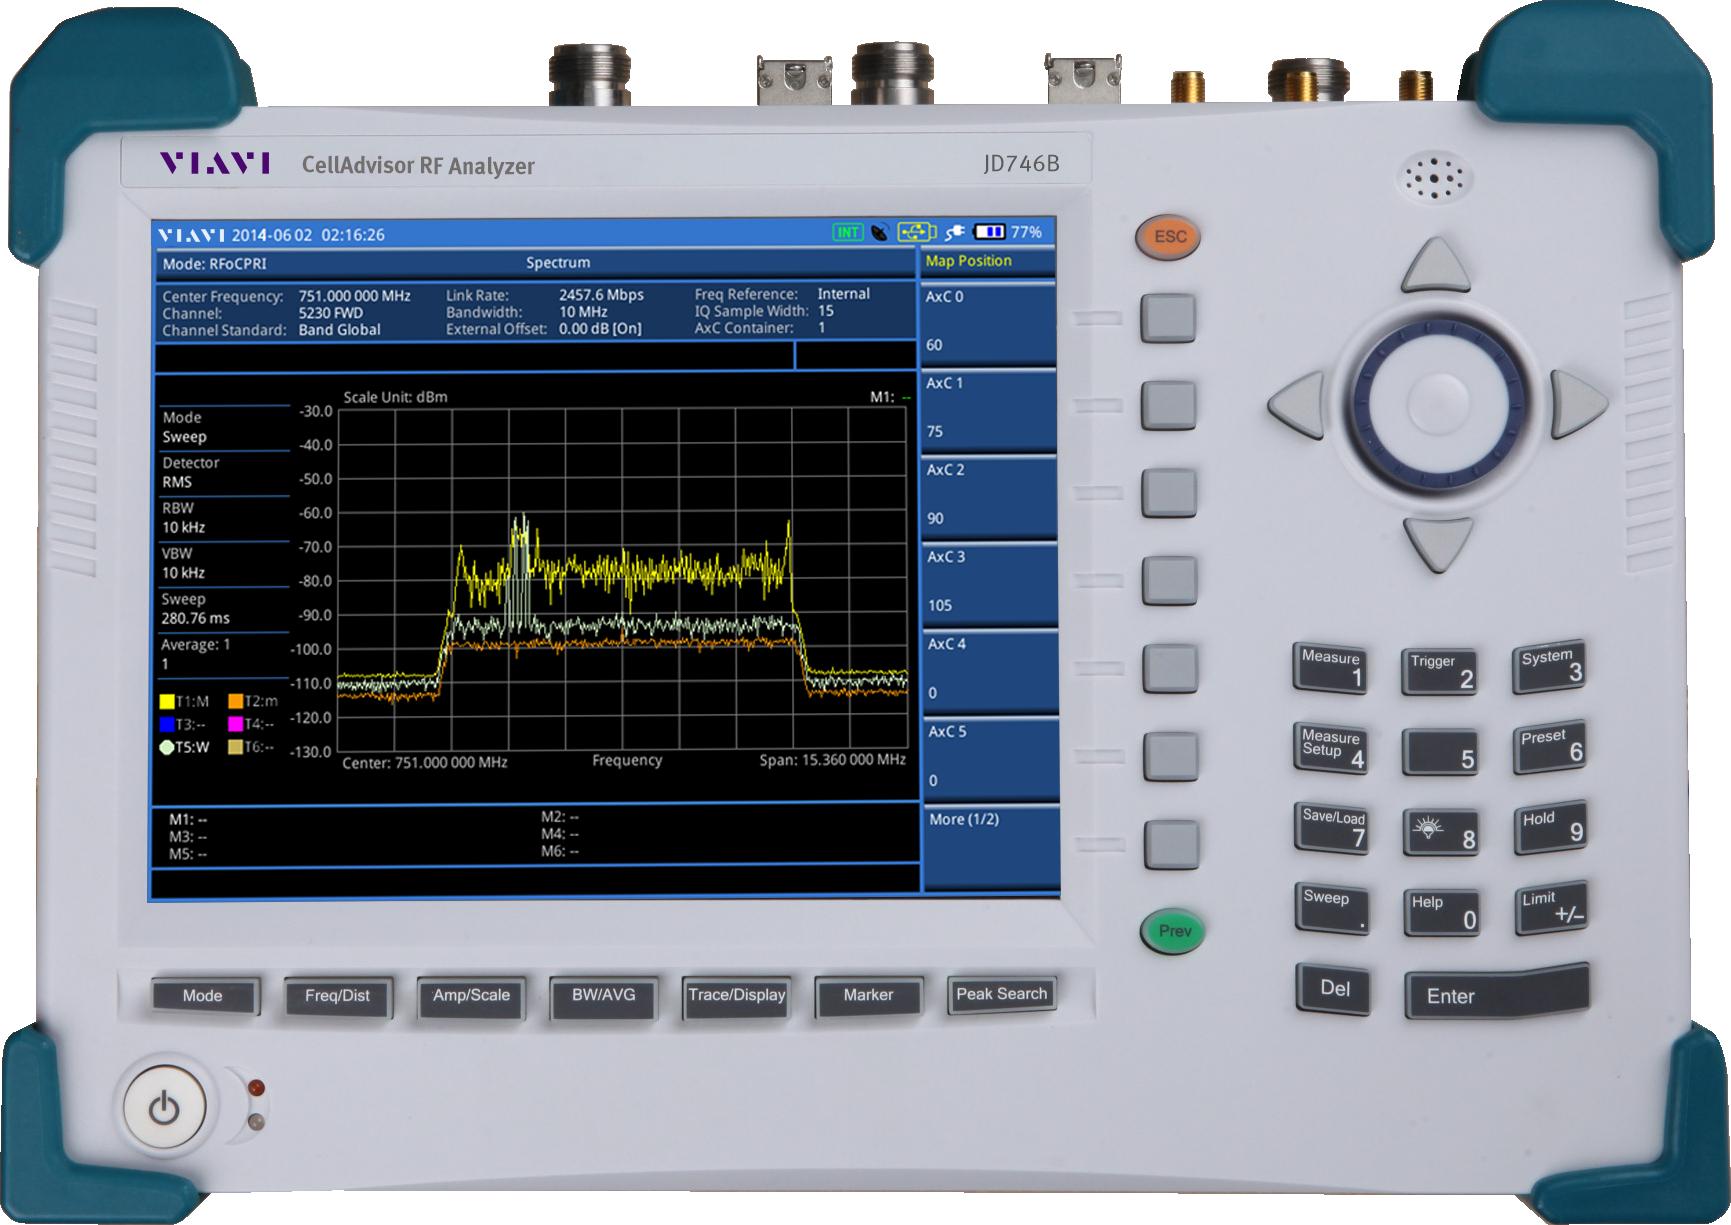 Cell Site Test Bbu Base Station Testing From Viavi Solutions Rf Network Cable Tester Celladvisor Analyzers Jd746b Jd786b